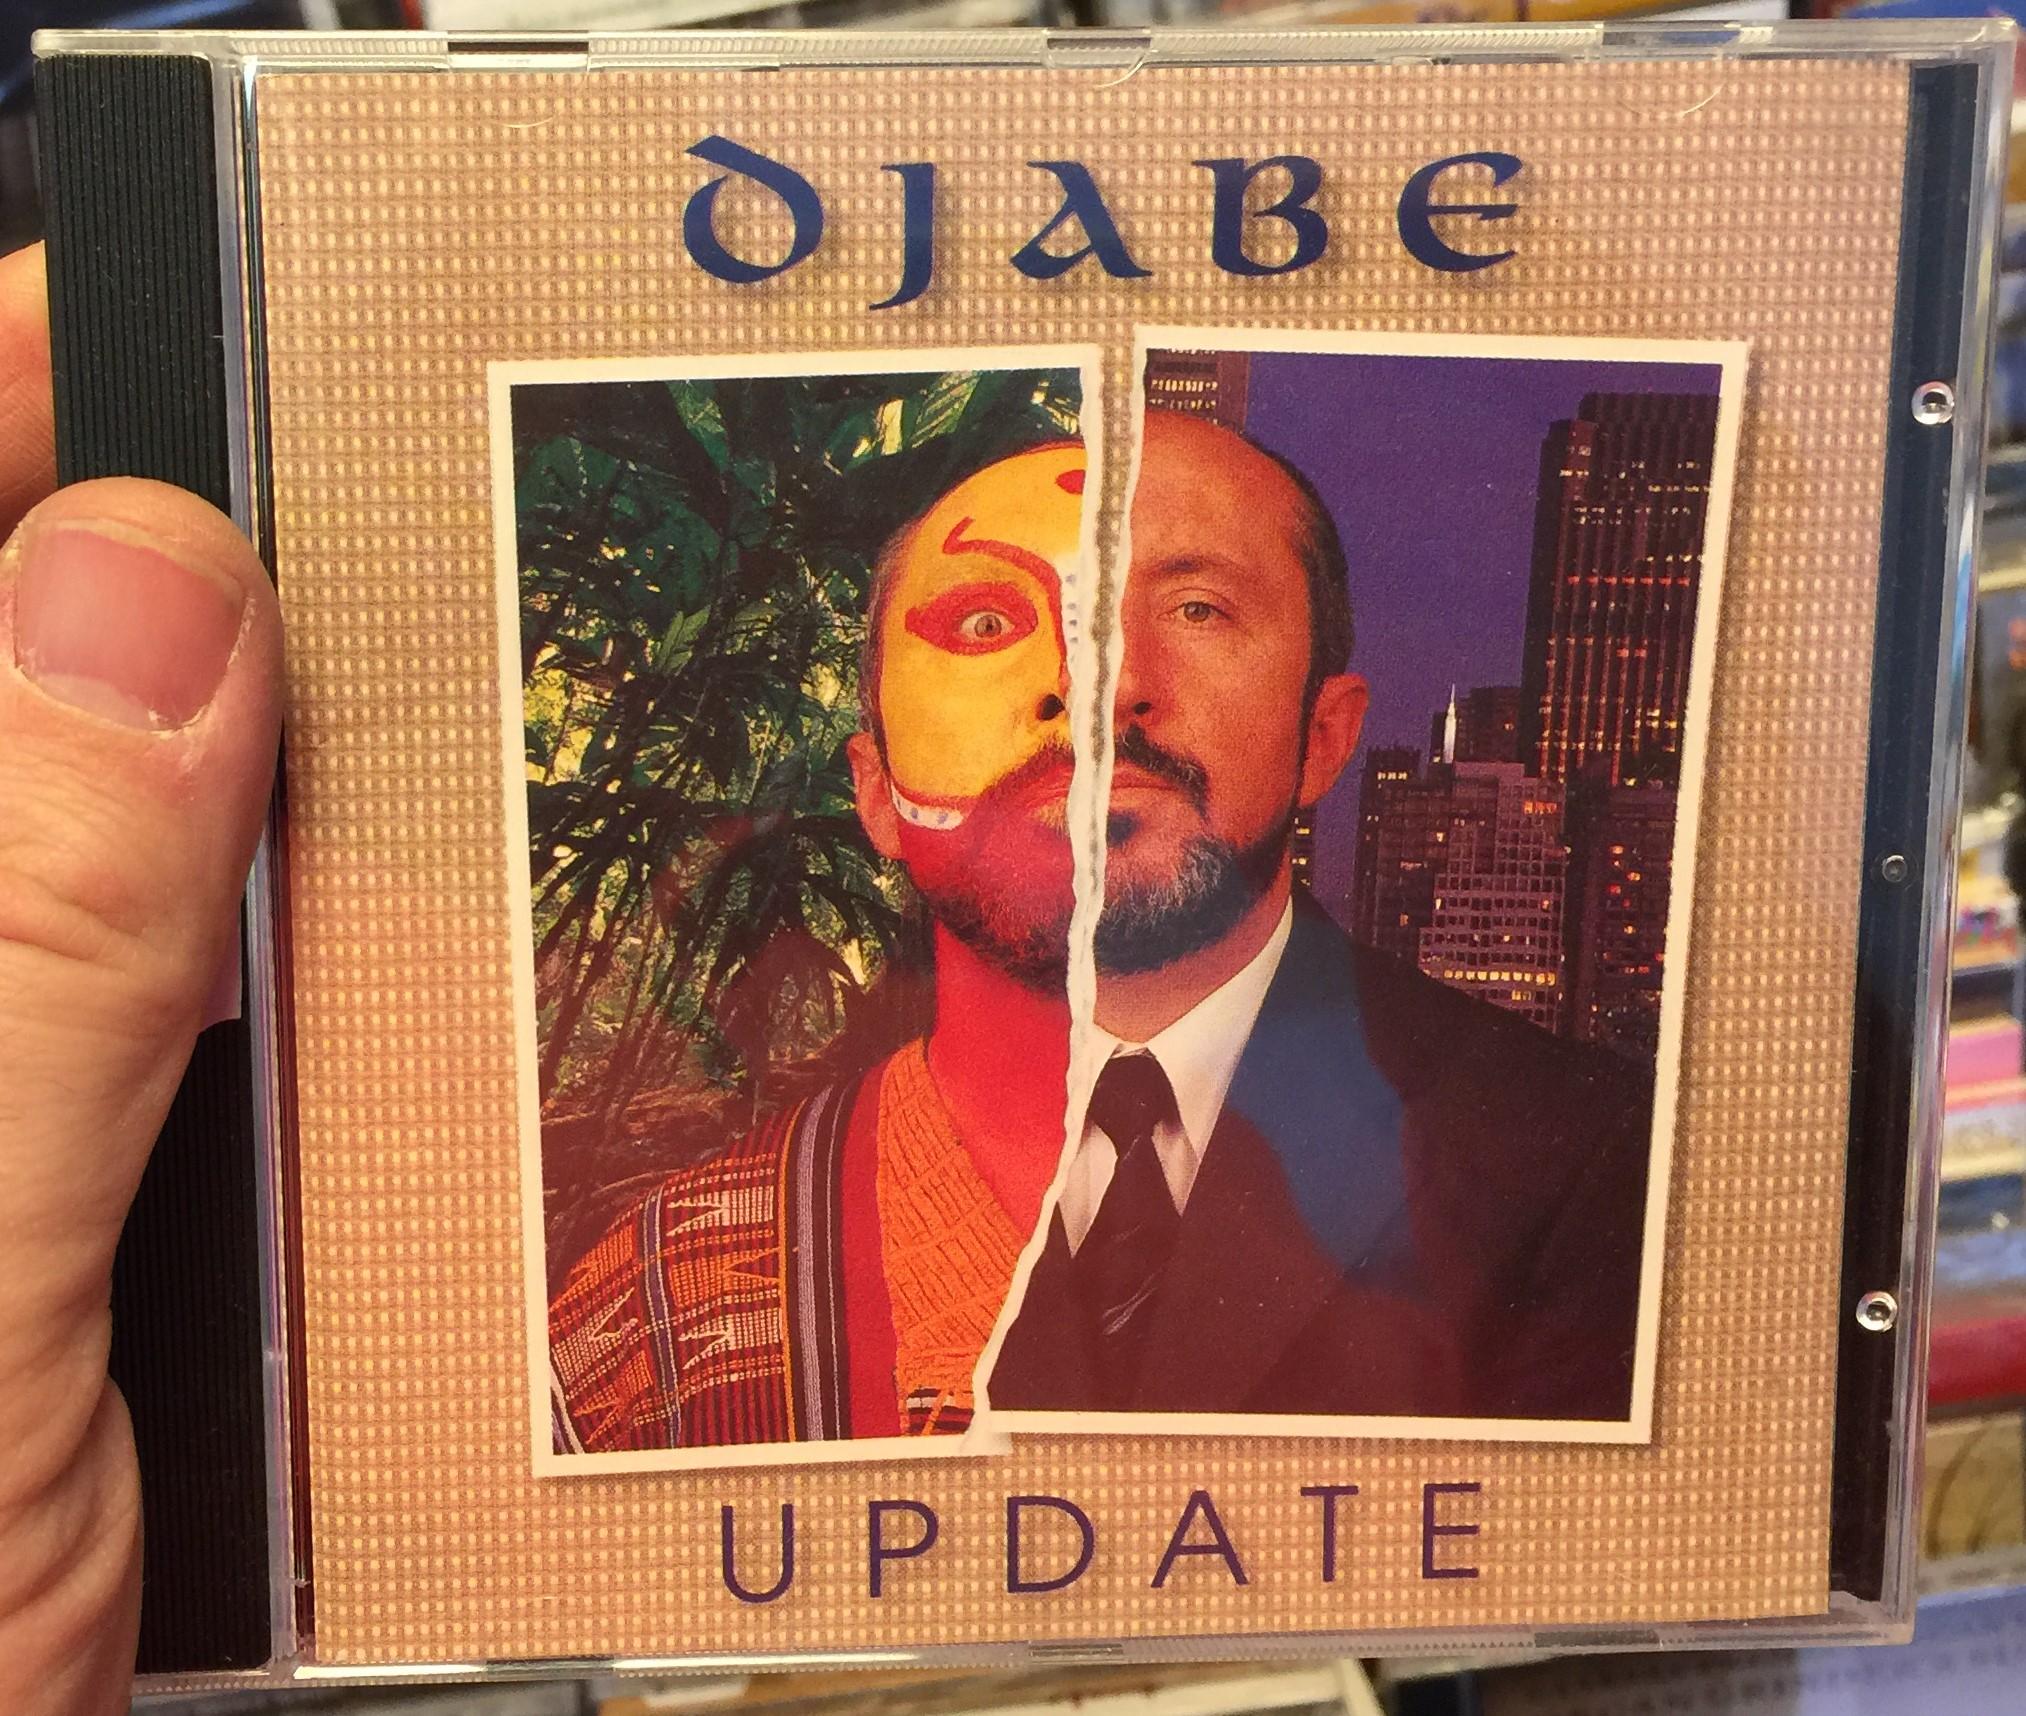 djabe-update-gramy-records-audio-cd-2001-gr-025-1-.jpg